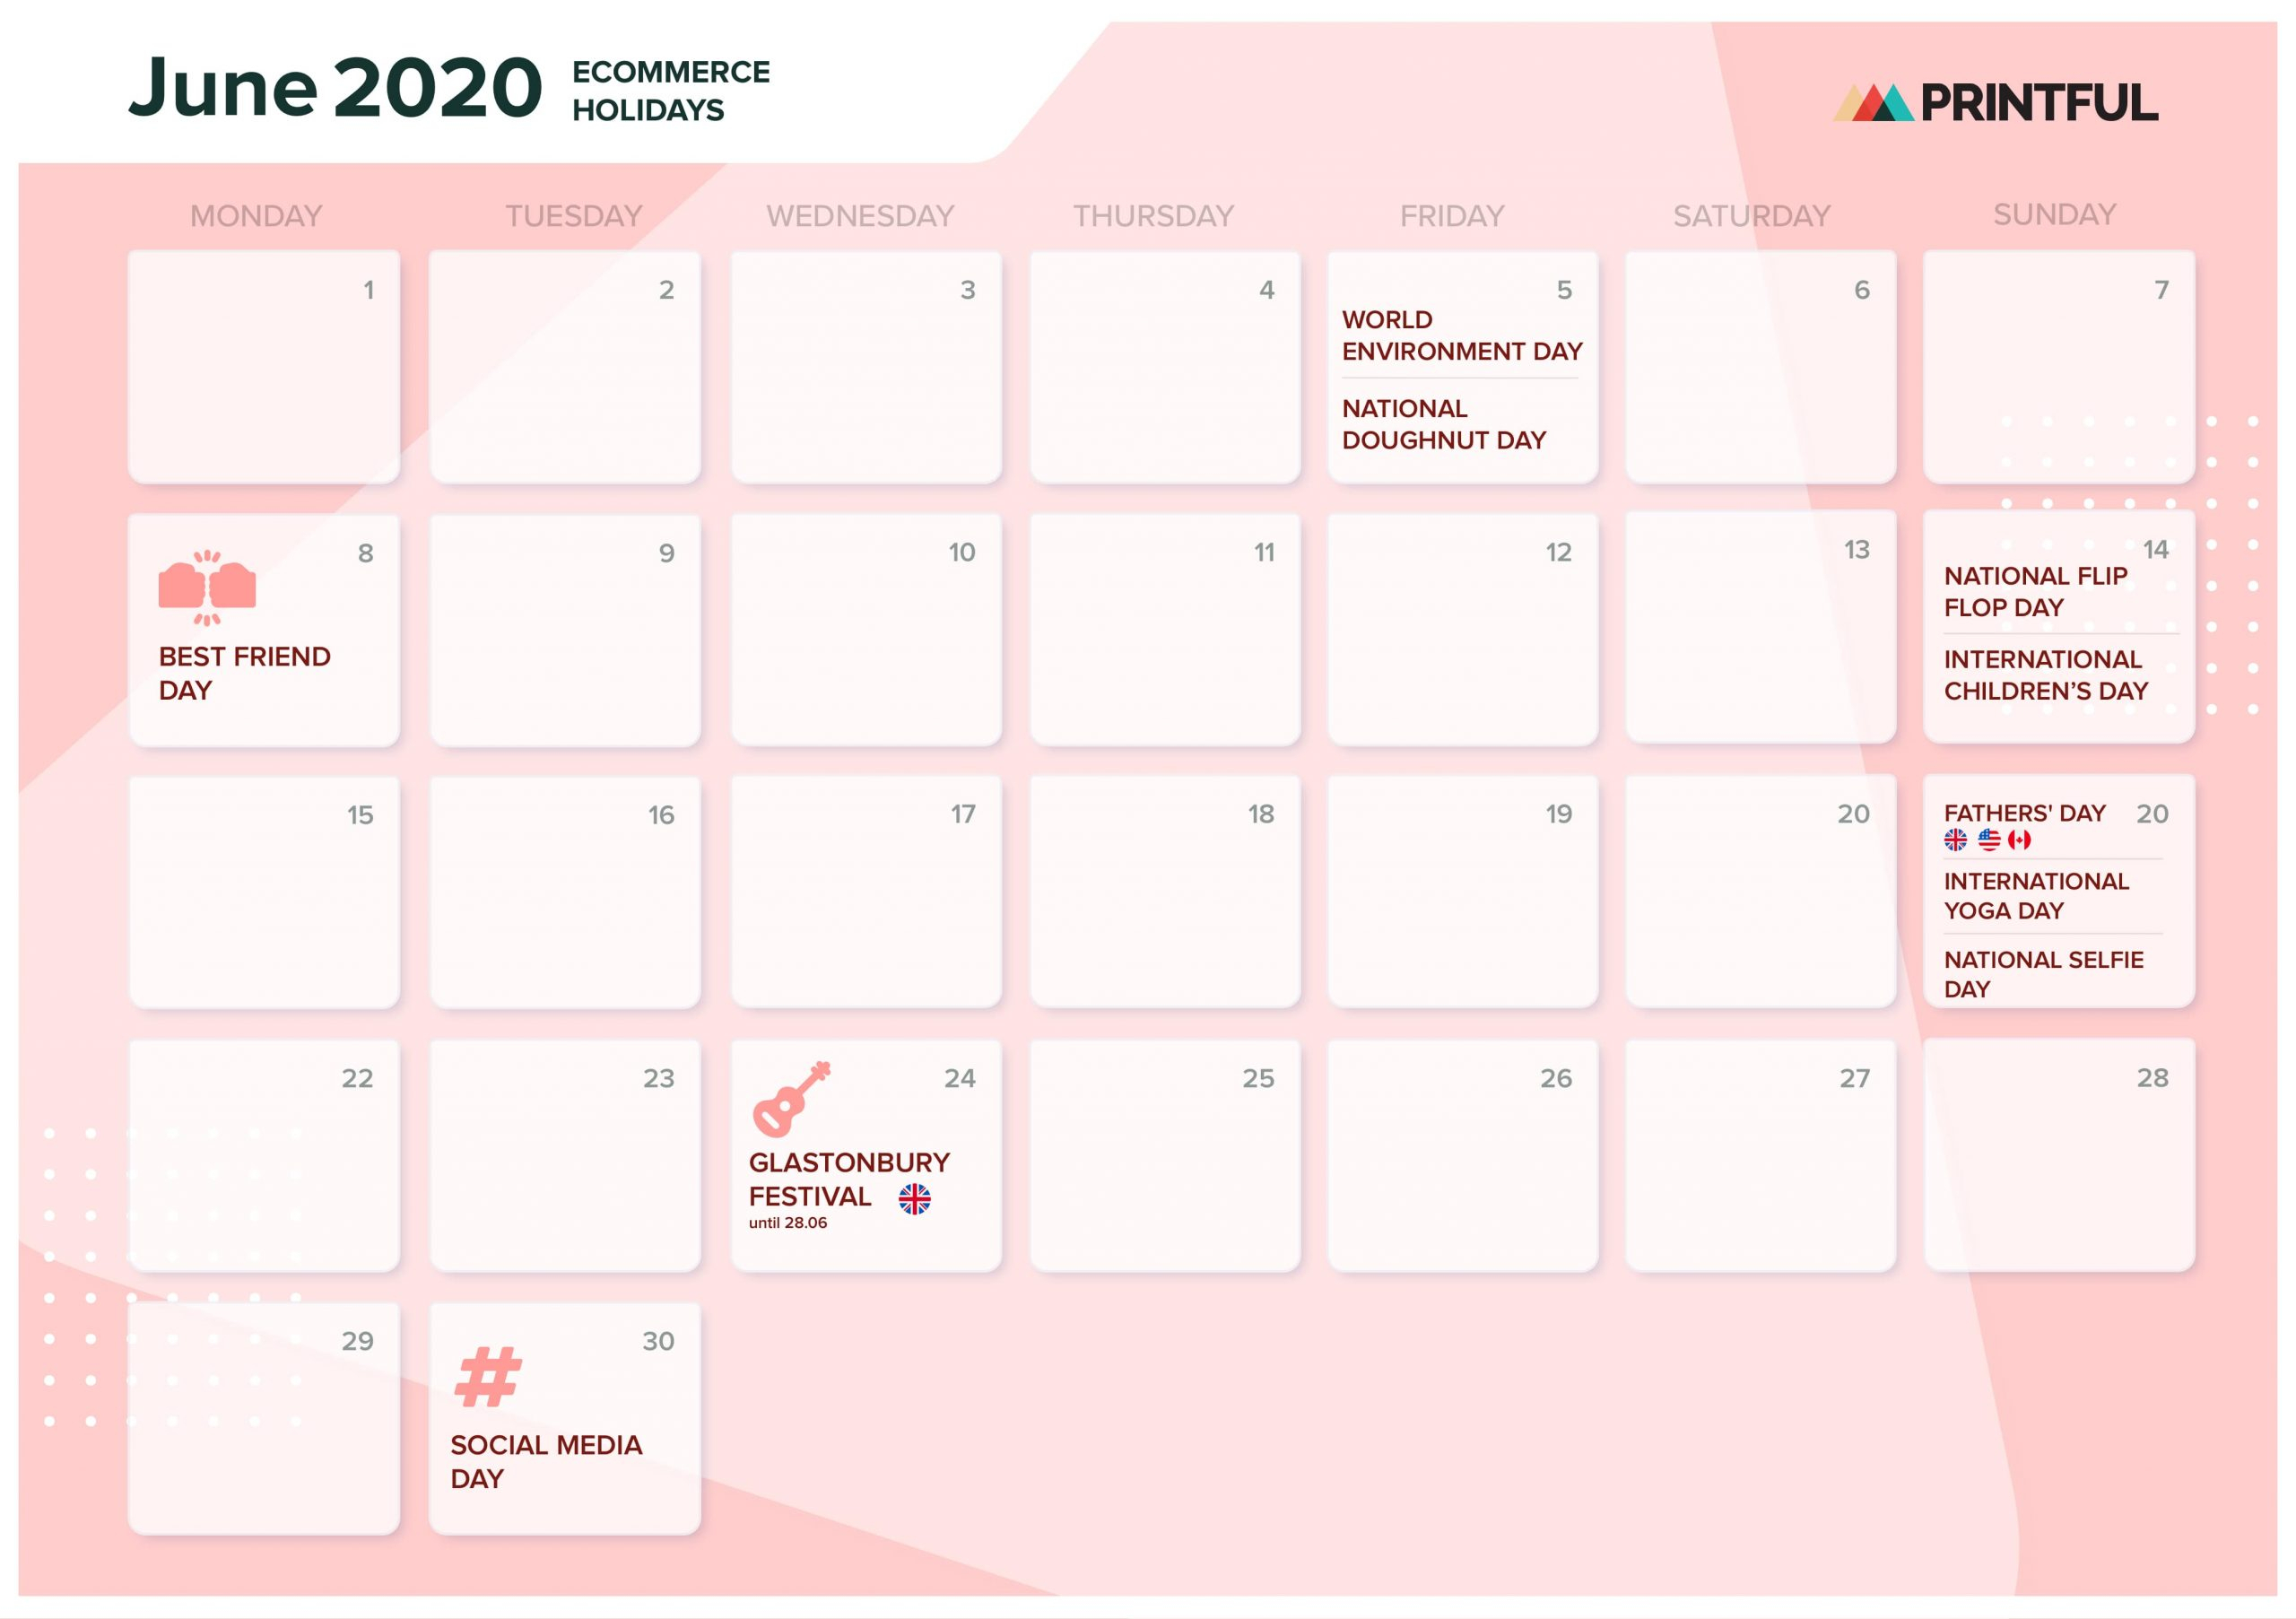 The Ultimate 2020 Ecommerce Holiday Marketing Calendar for 2020 Hong Kong Calendar Excel